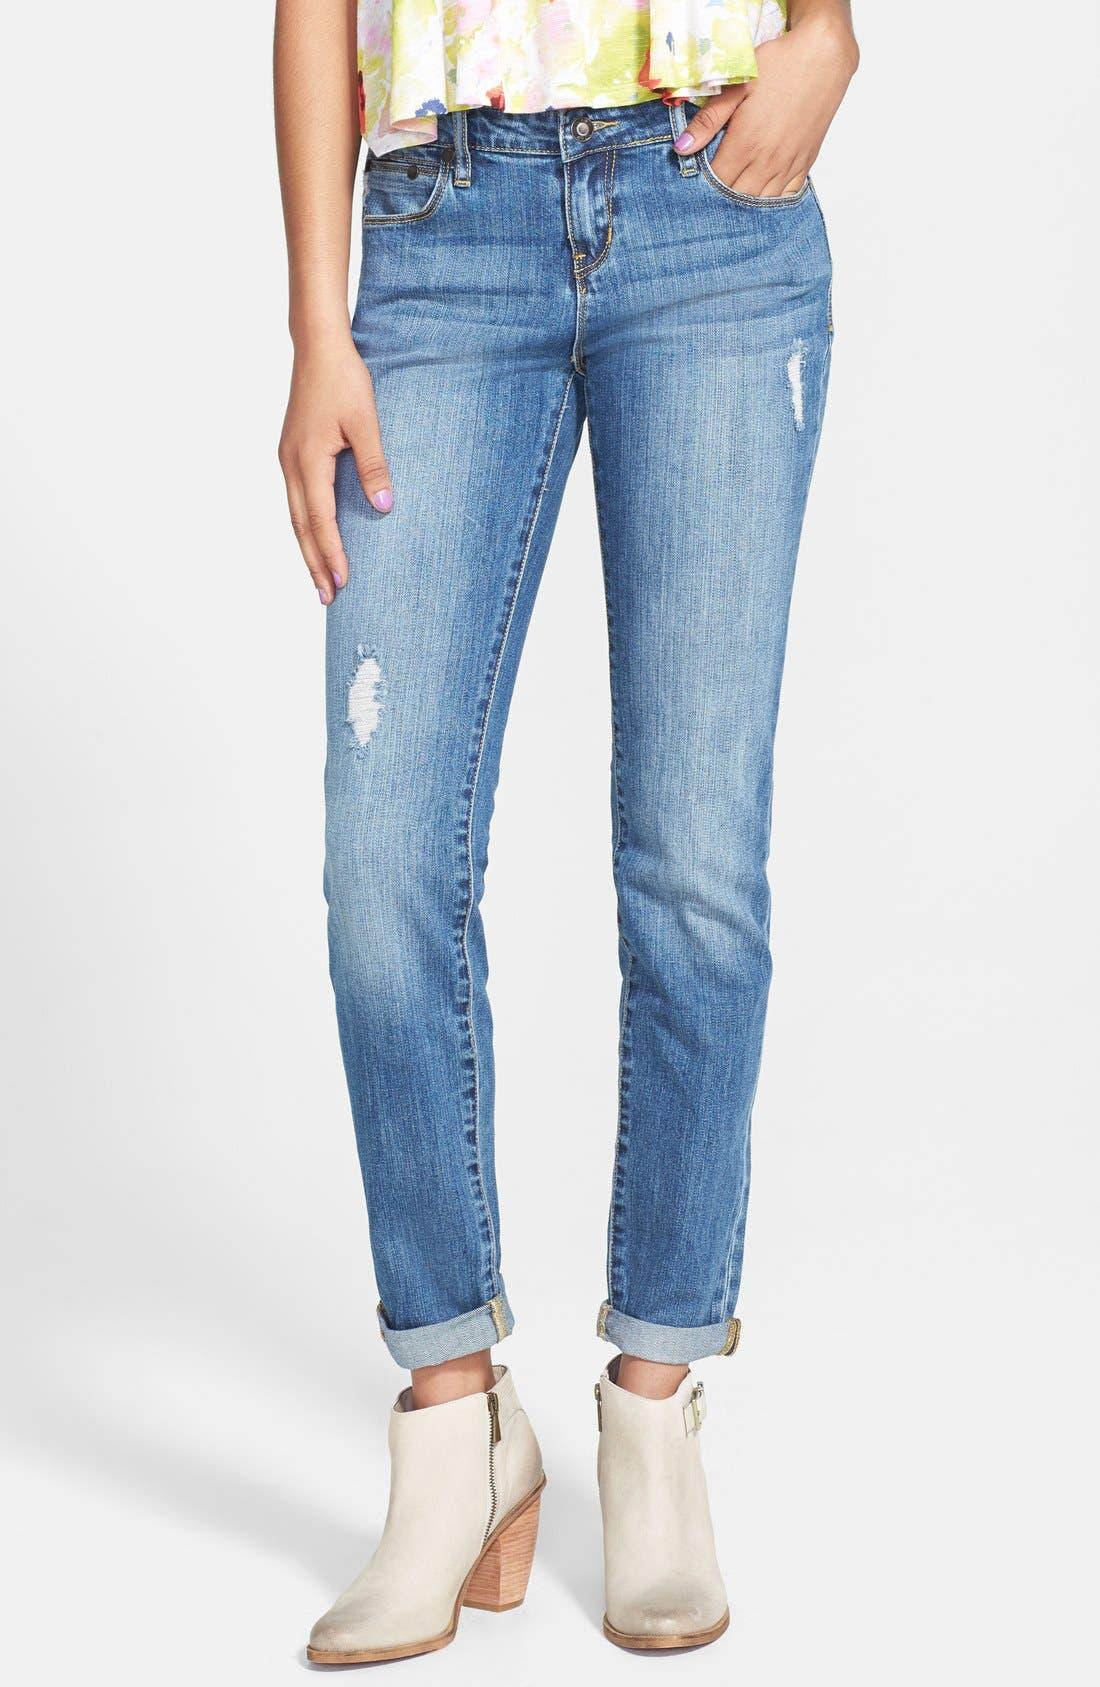 Alternate Image 1 Selected - THIS CITY Destroyed Skinny Boyfriend Jeans (Medium) (Juniors)